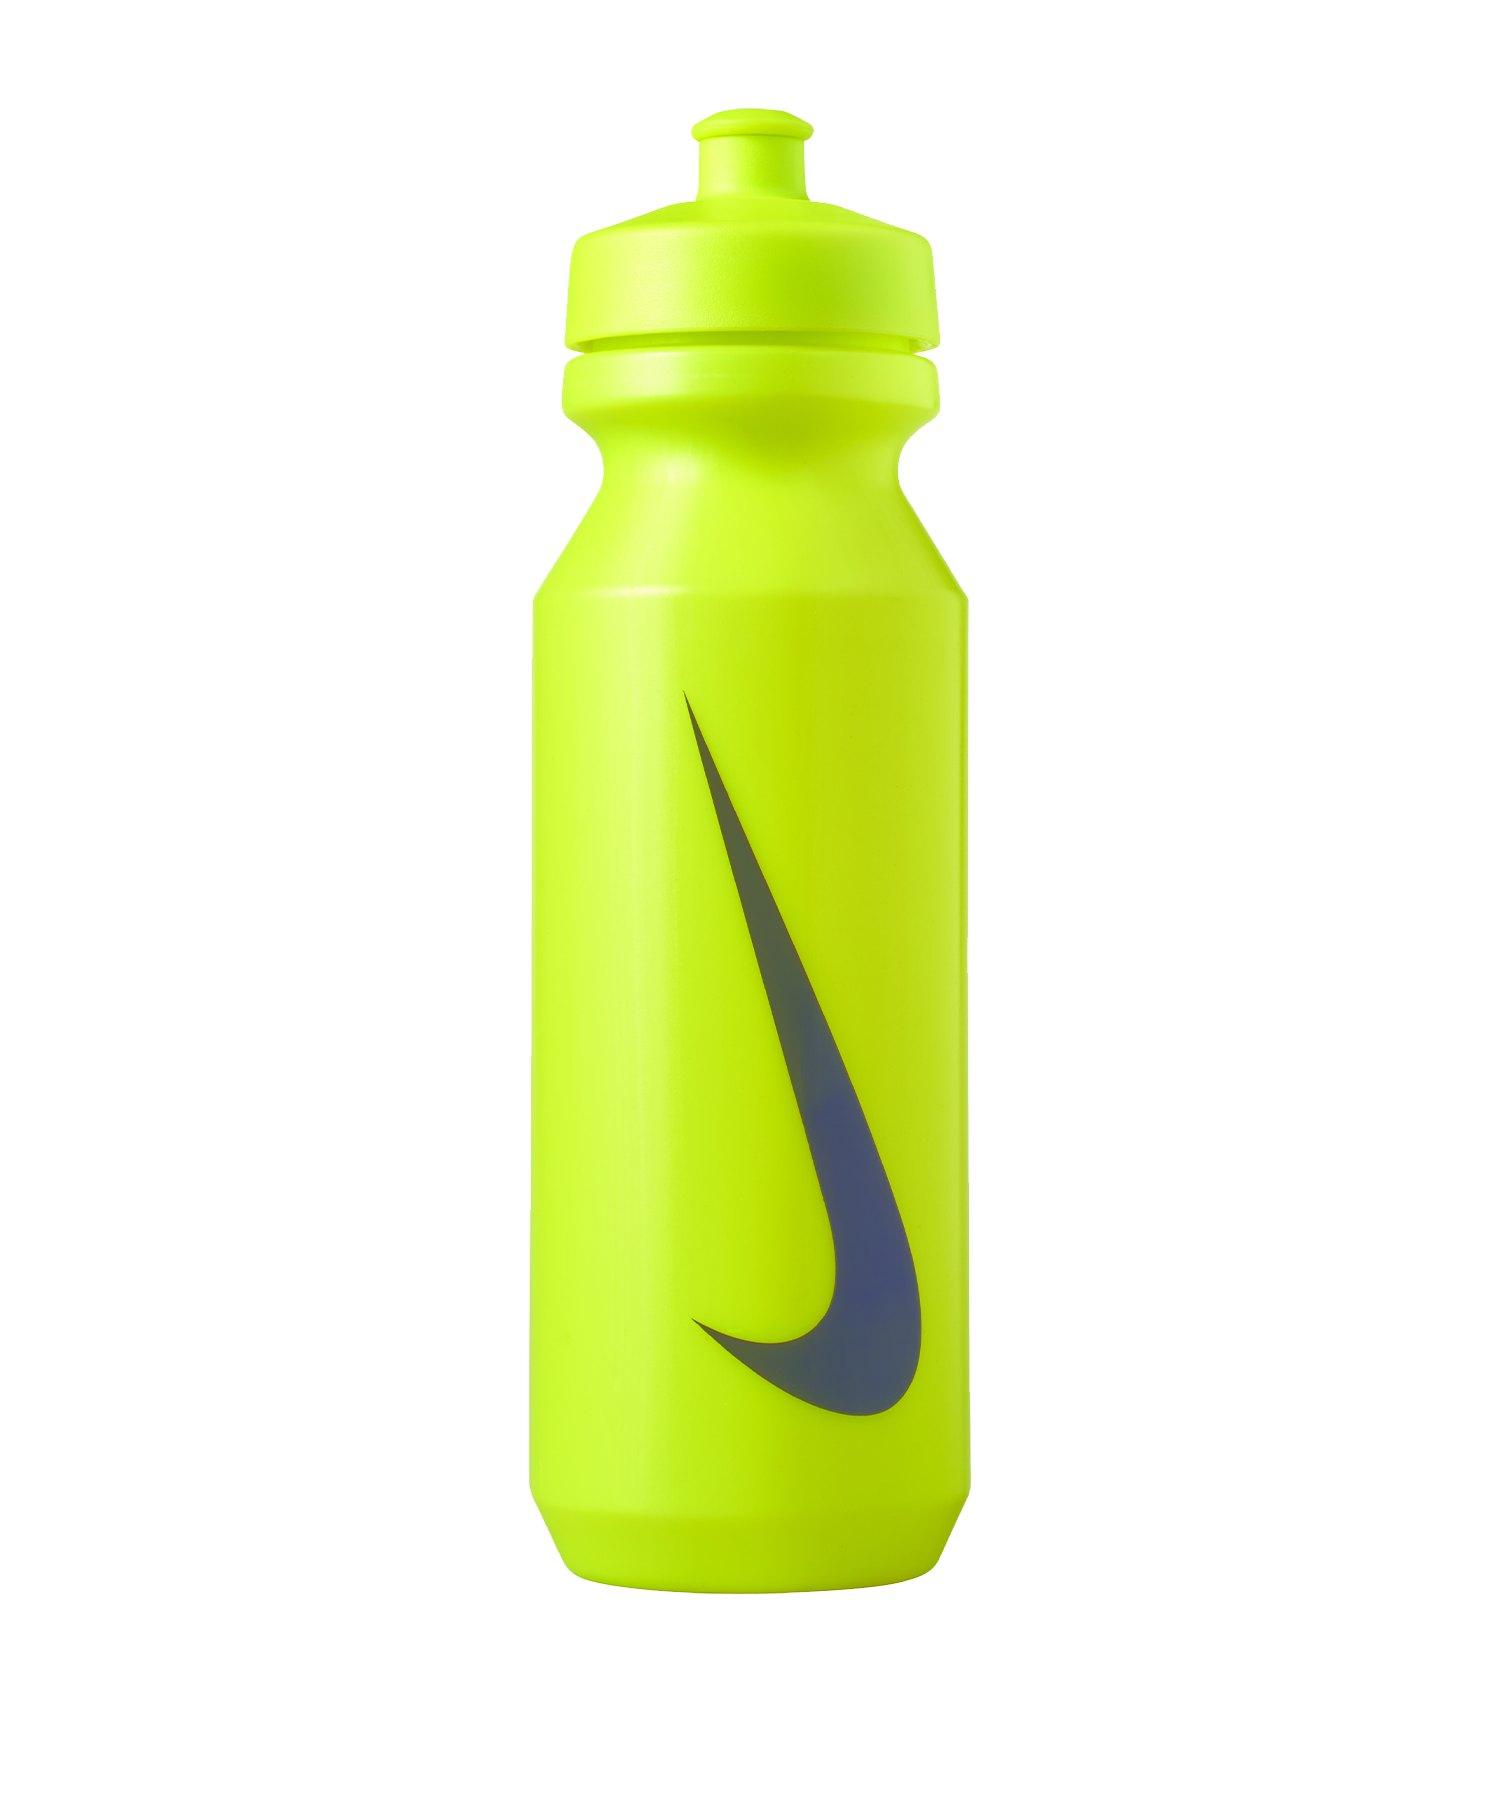 Nike Big Mouth Trinkflasche 956 ml F306 - gruen